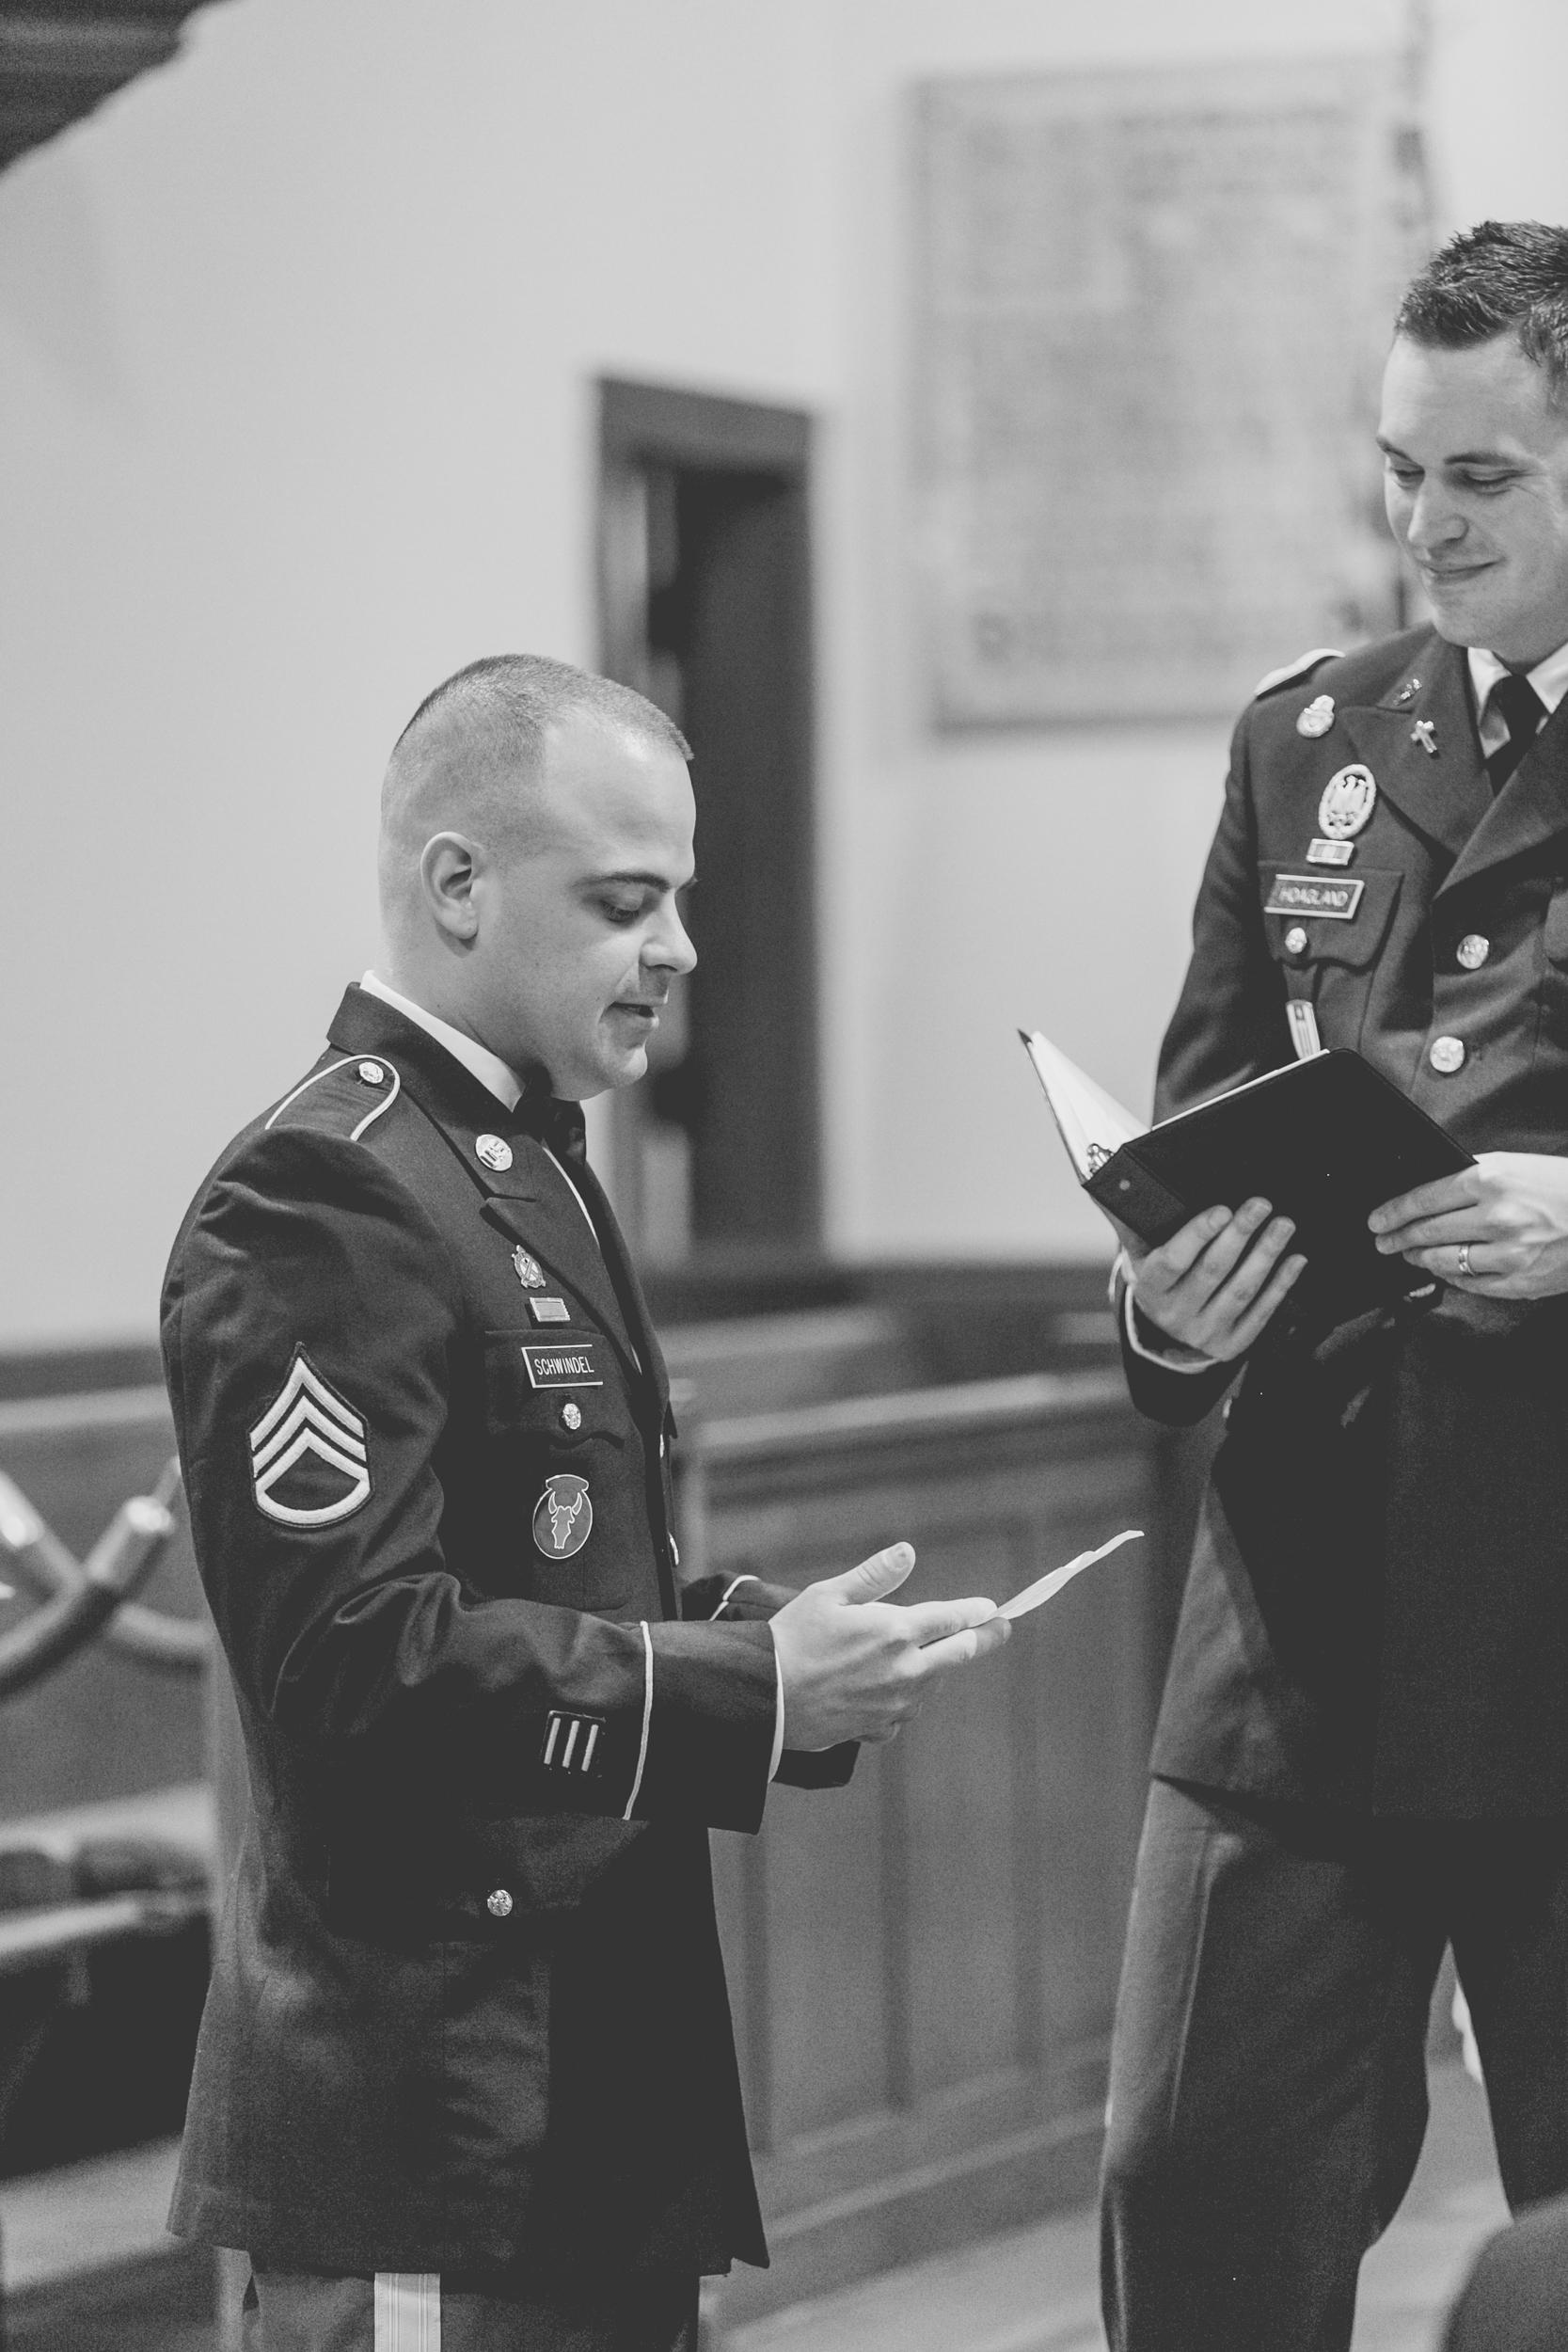 Fort Snelling Elopement St. Paul, MN, Fort Snelling Elopement, Military Elopement, Intimate Military Wedding, intimate elopement wedding-www.rachelsmak.com30.jpg